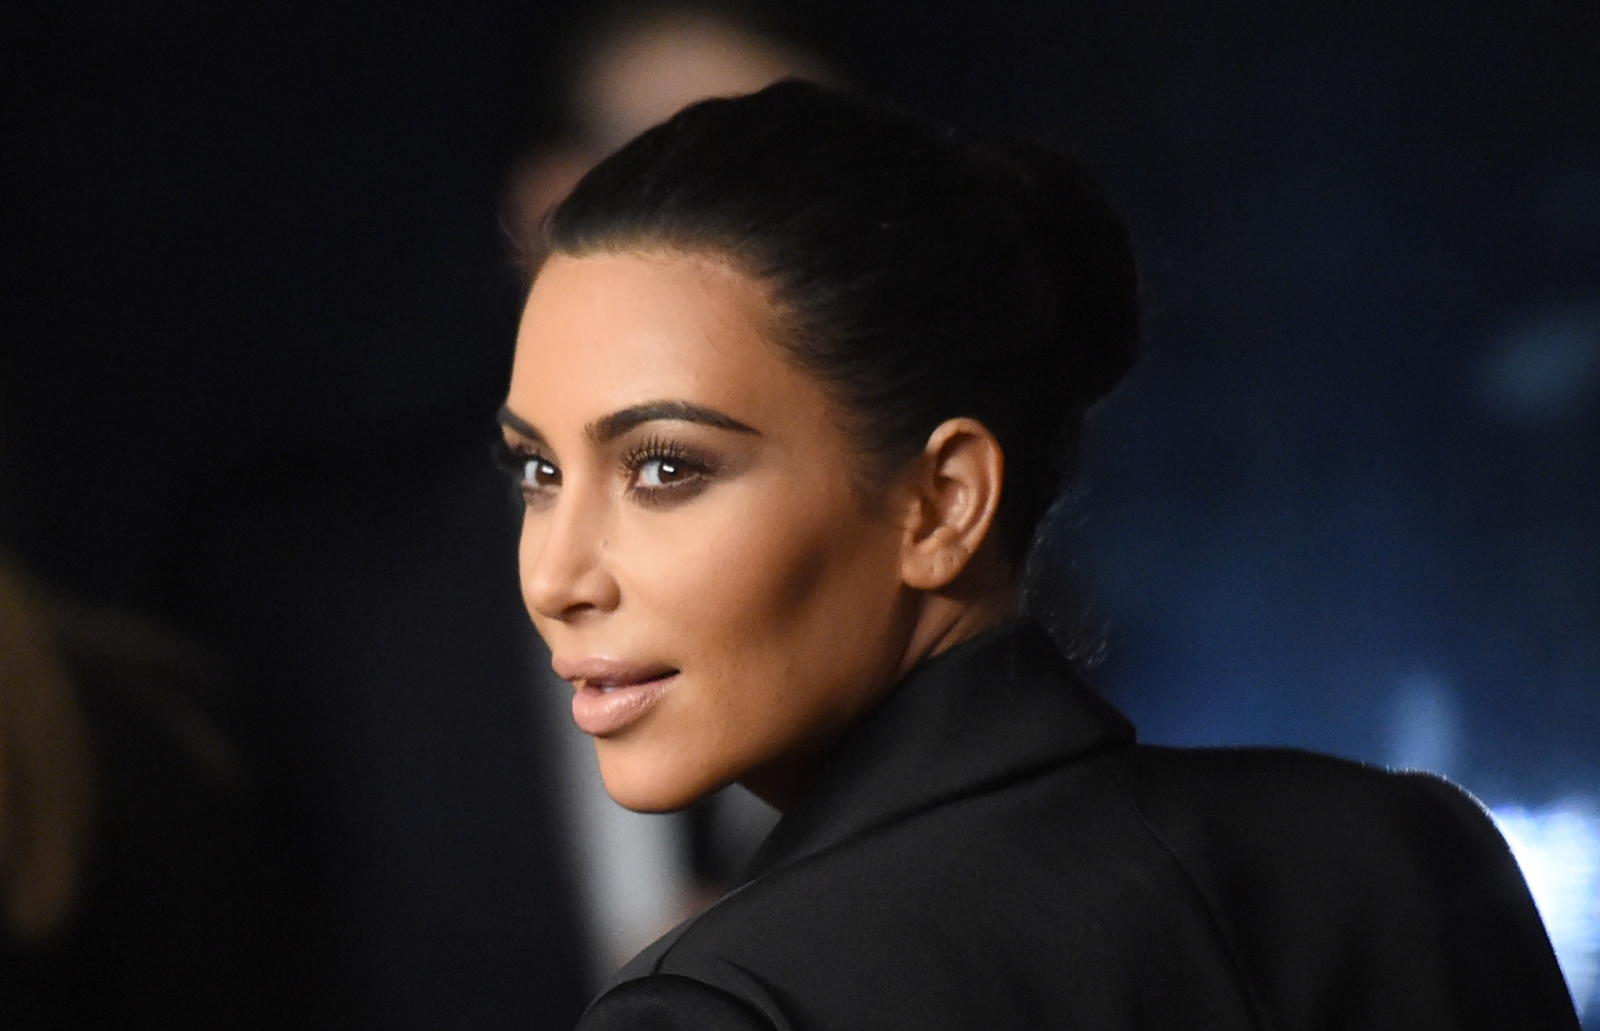 Kim Kardashian's Uncle Helped to Revive Brandy on Plane